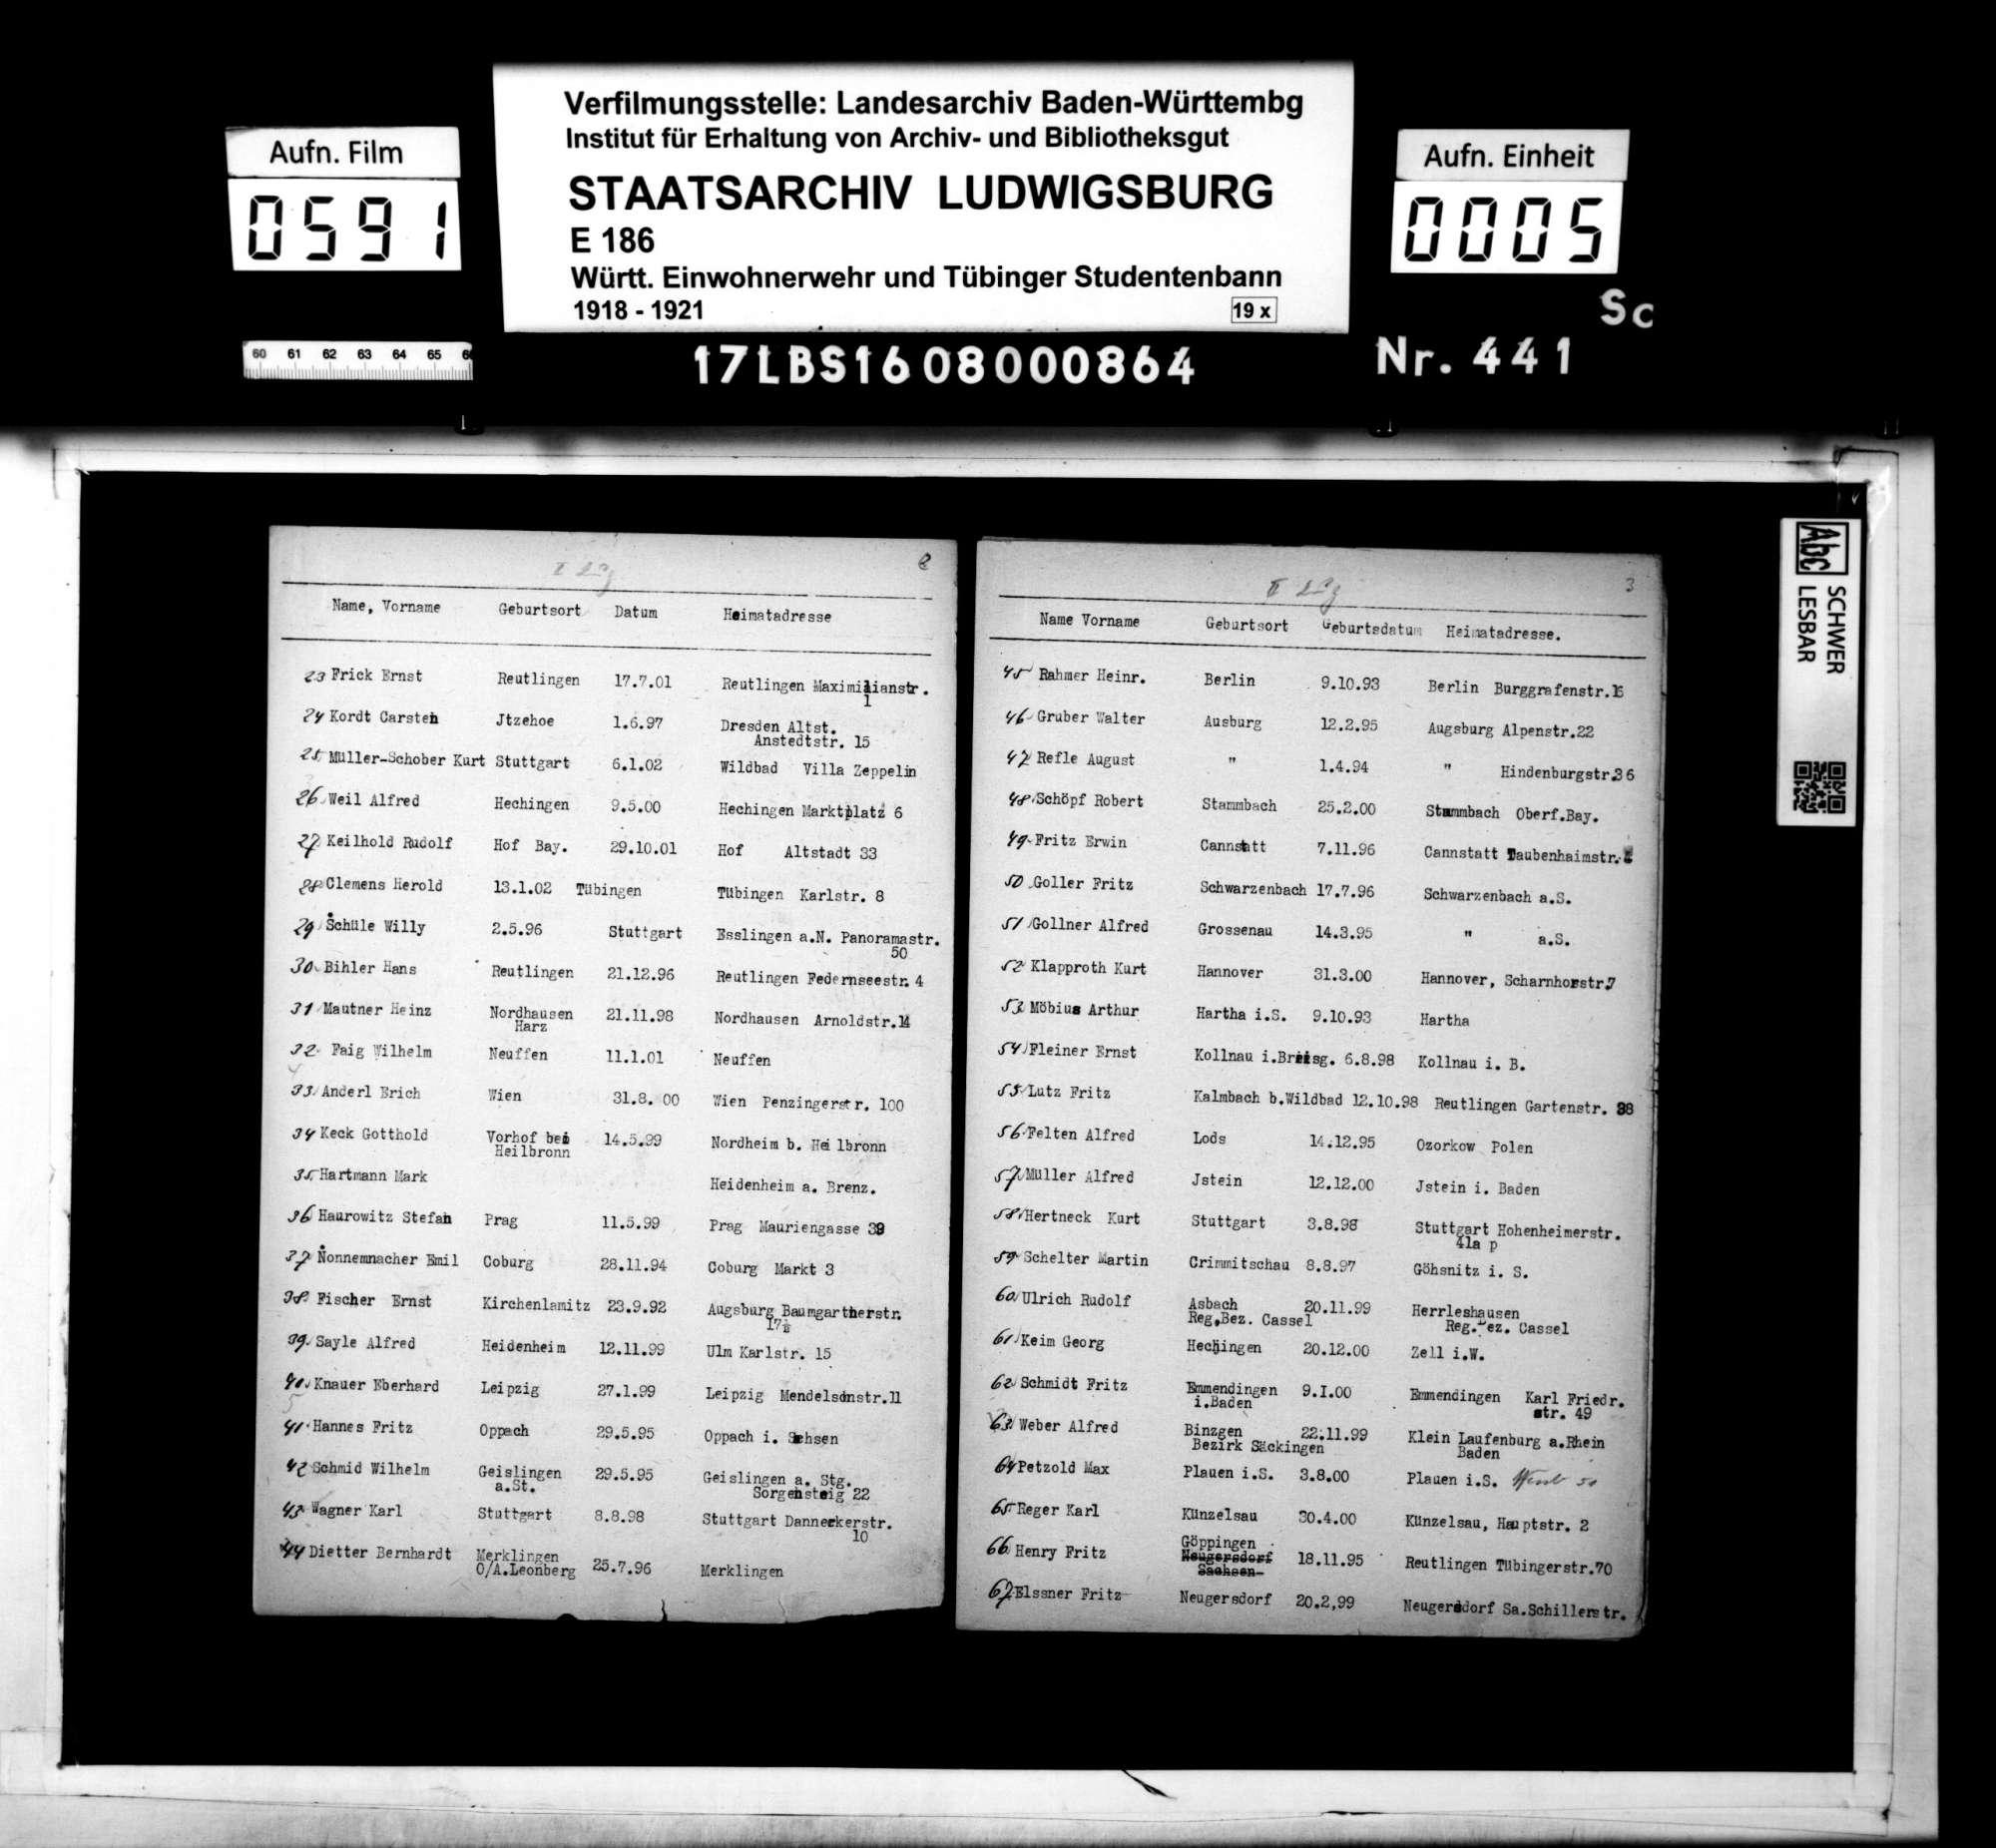 Techniker-Kompanie aus Reutlingen, Bild 3